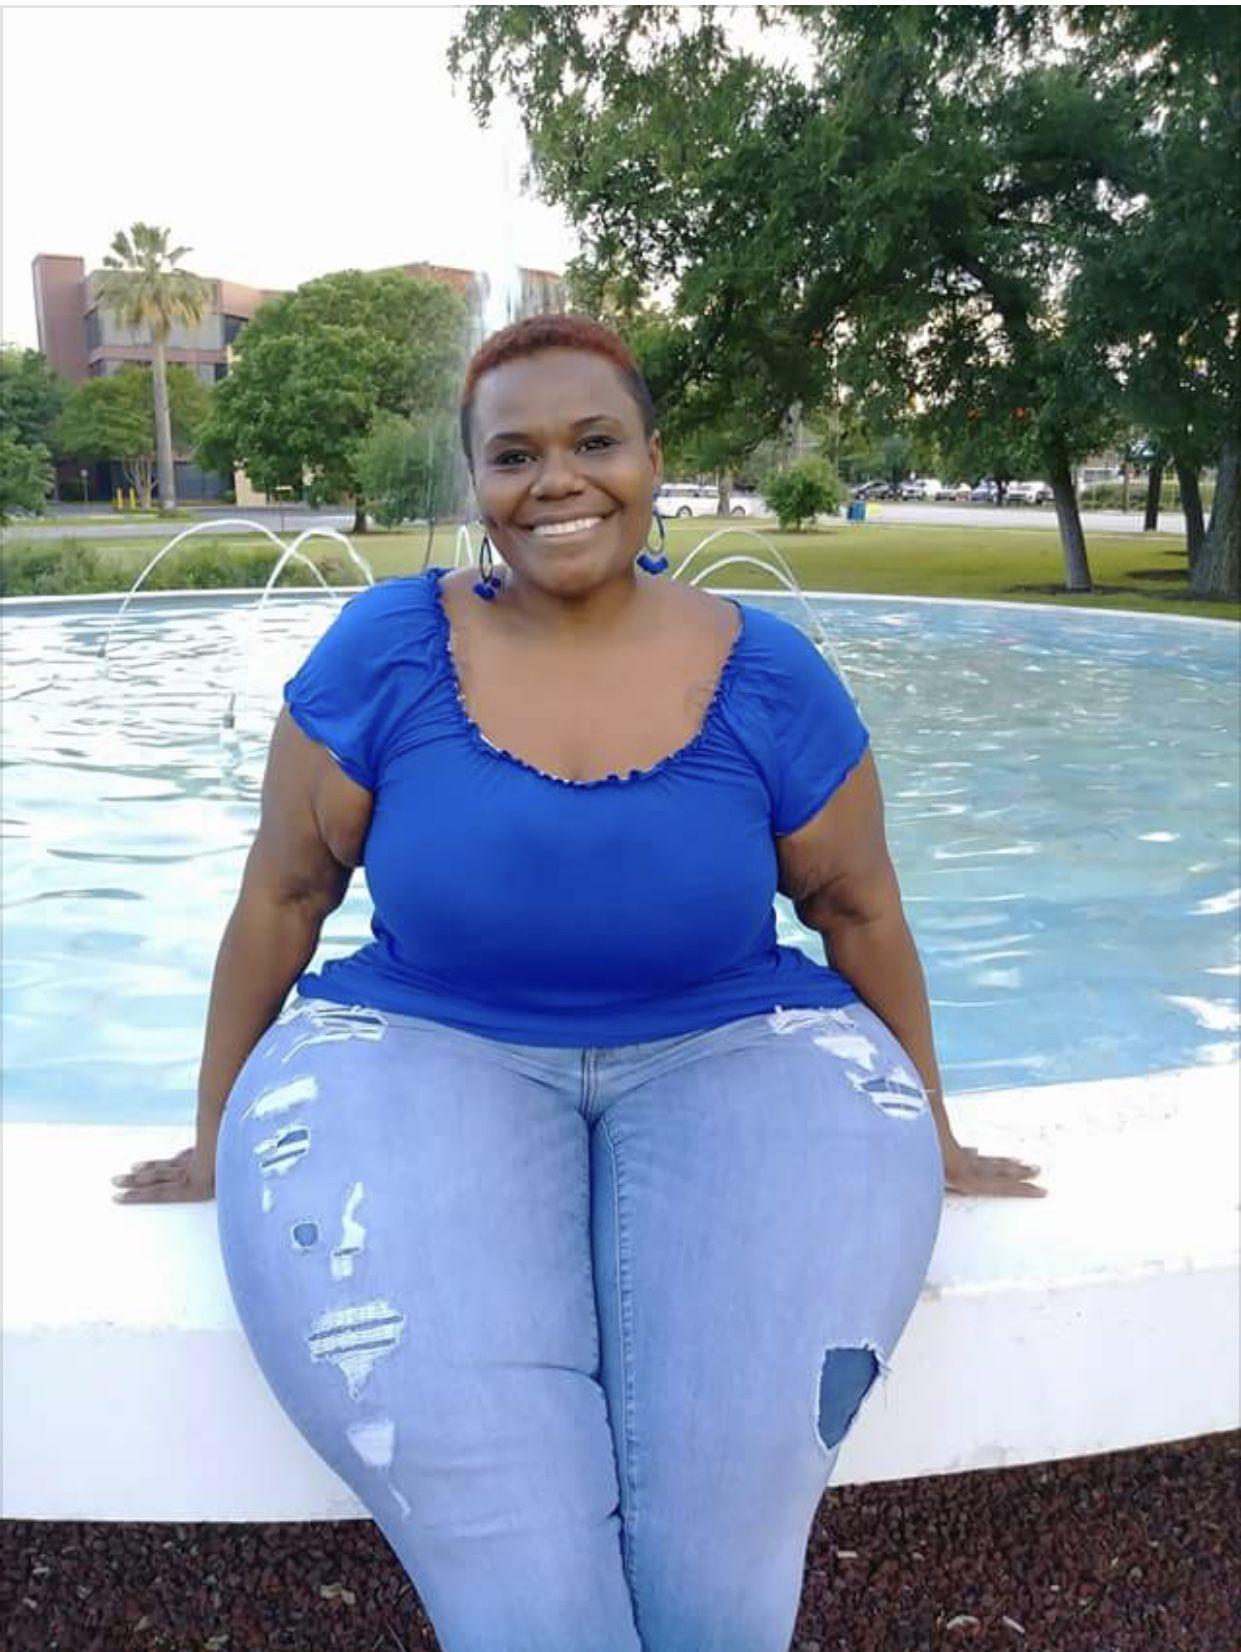 b3cf679ee Big Black Woman, Black Women, Thick Body, Ssbbw, Beautiful Curves, Well